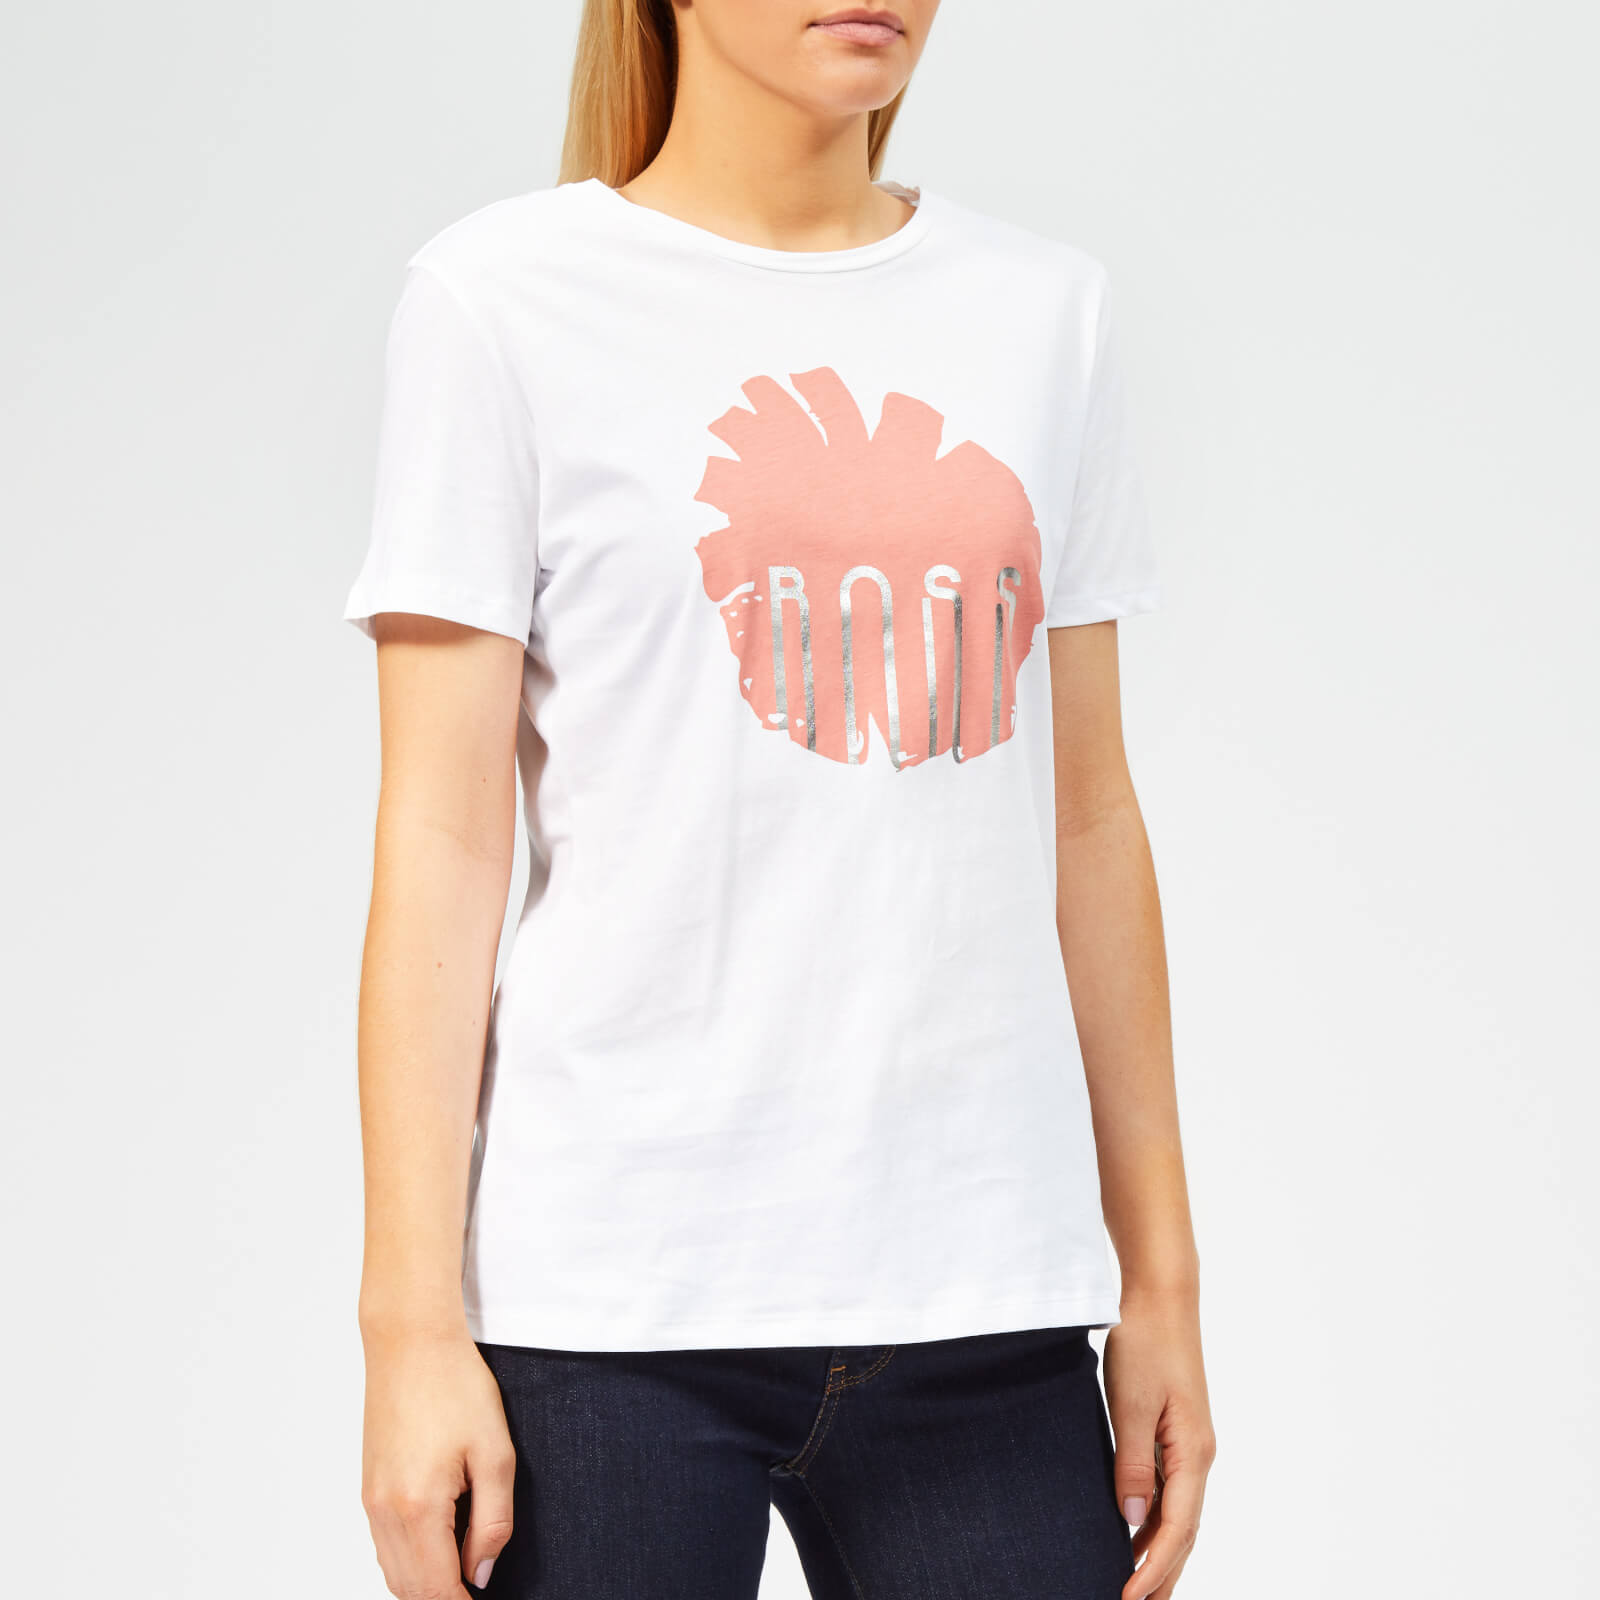 72565c606 BOSS Women's Teblossom T-Shirt - White Womens Clothing   TheHut.com